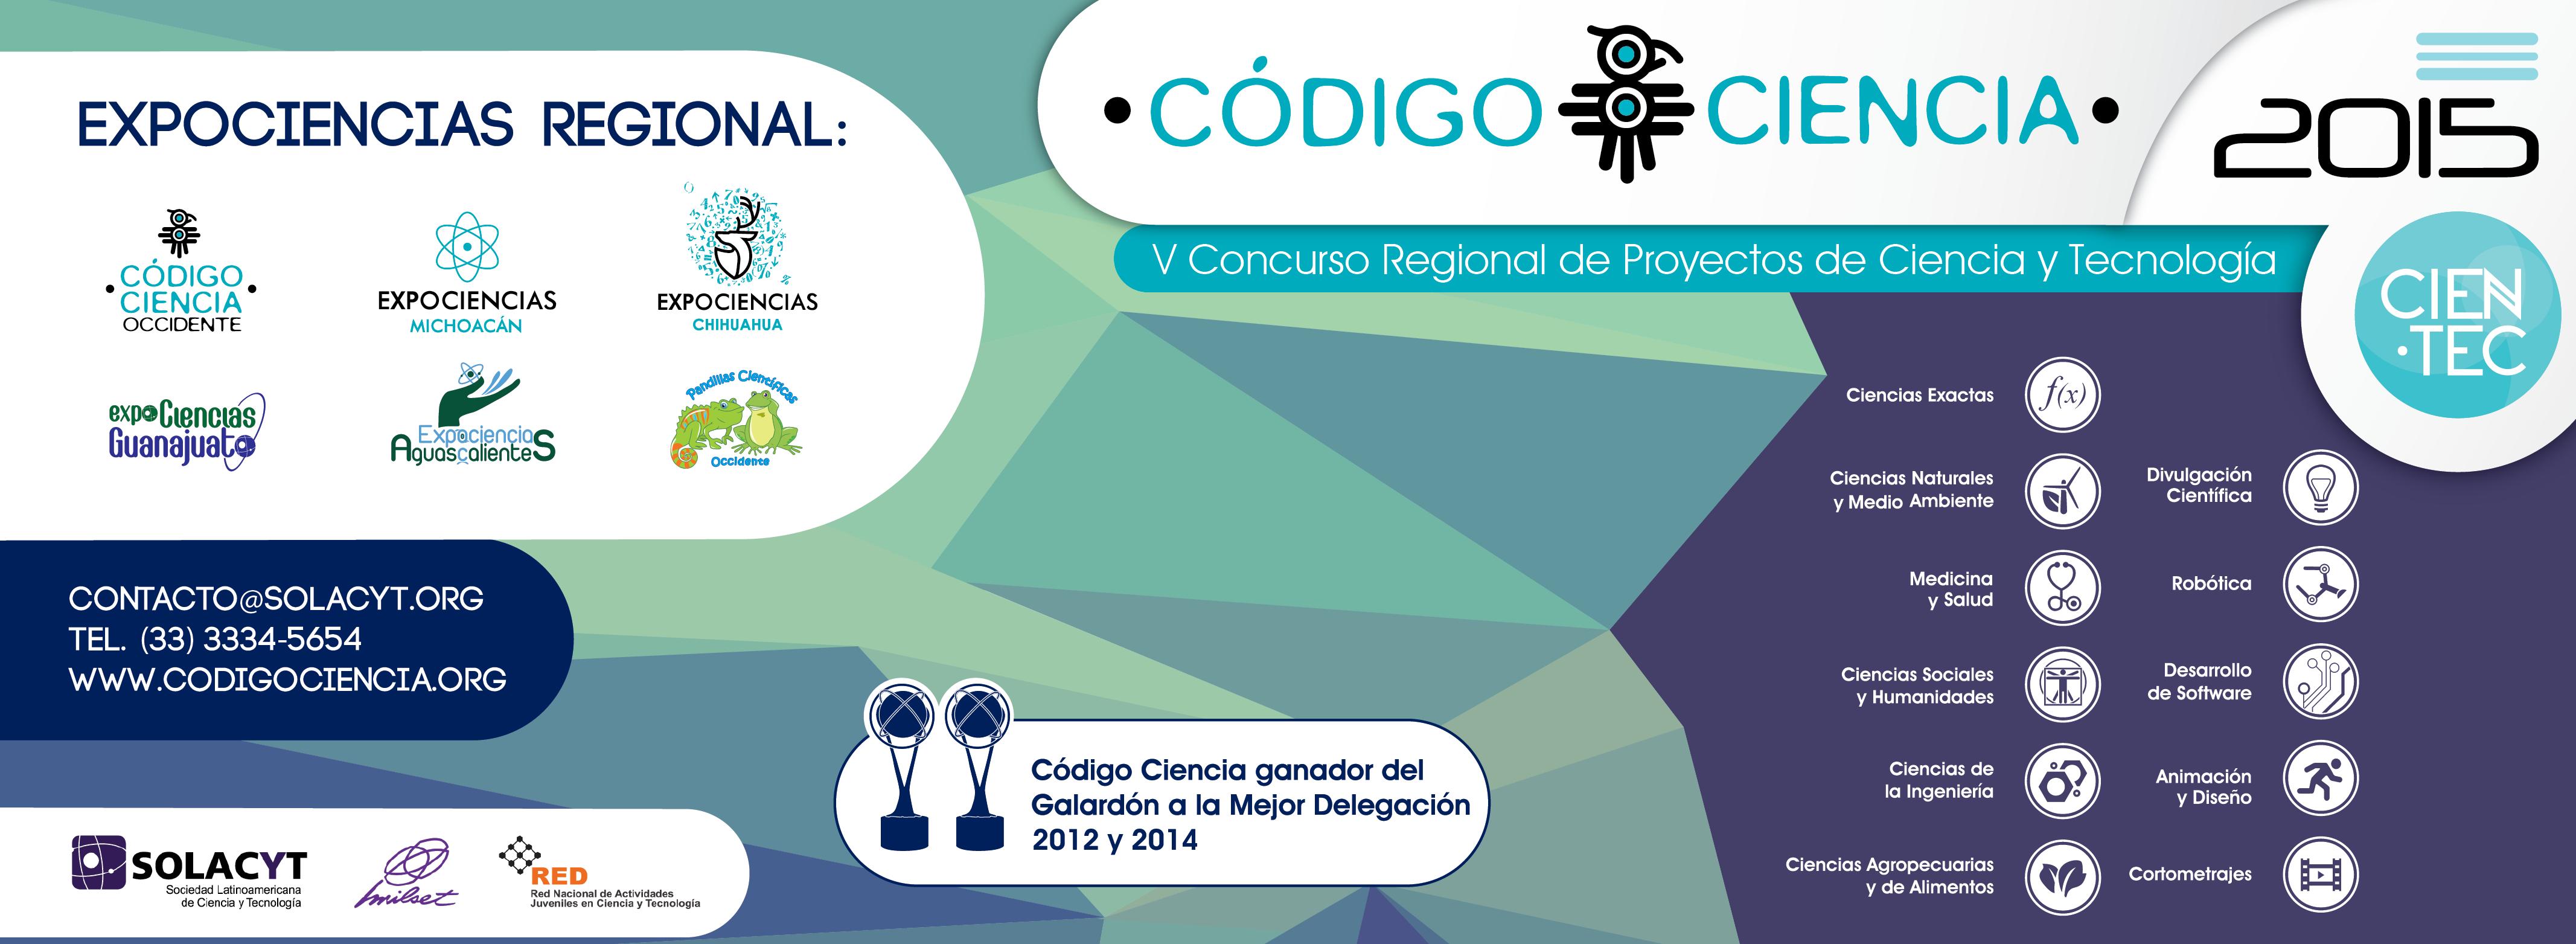 postalinformativa_COCO2015-02